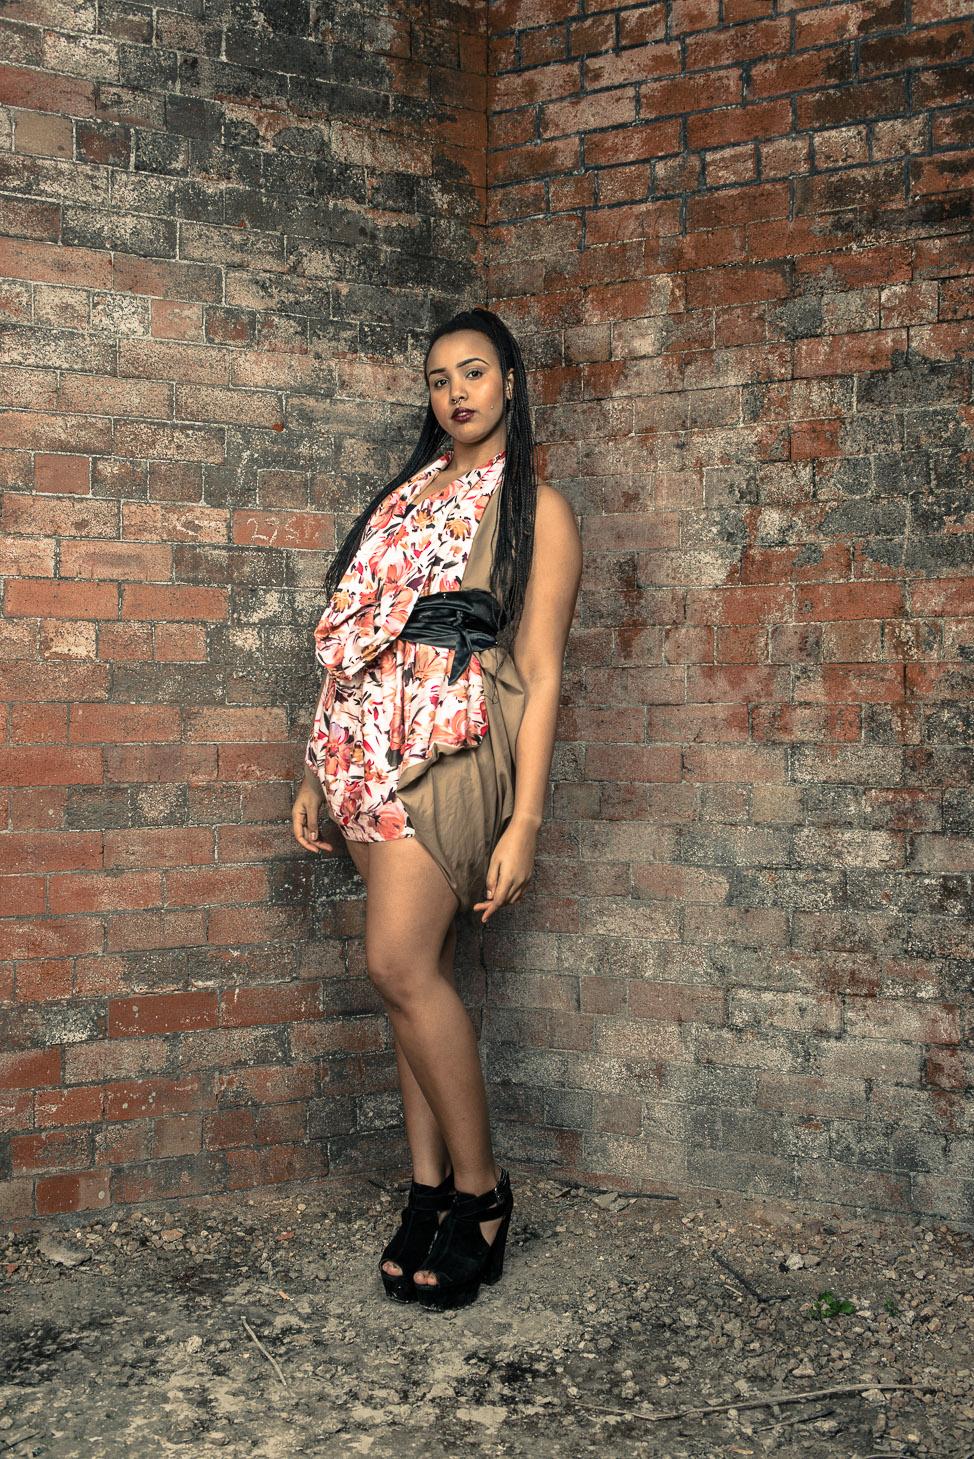 zaramia-ava-zaramiaava-leeds-fashion-designer-ethical-sustainable-tailored-minimalist-burgundy-versatile-drape-dress-flower-nude-print-belt-wrap-cowl-styling-bodysuit-womenswear-models-photoshoot-10